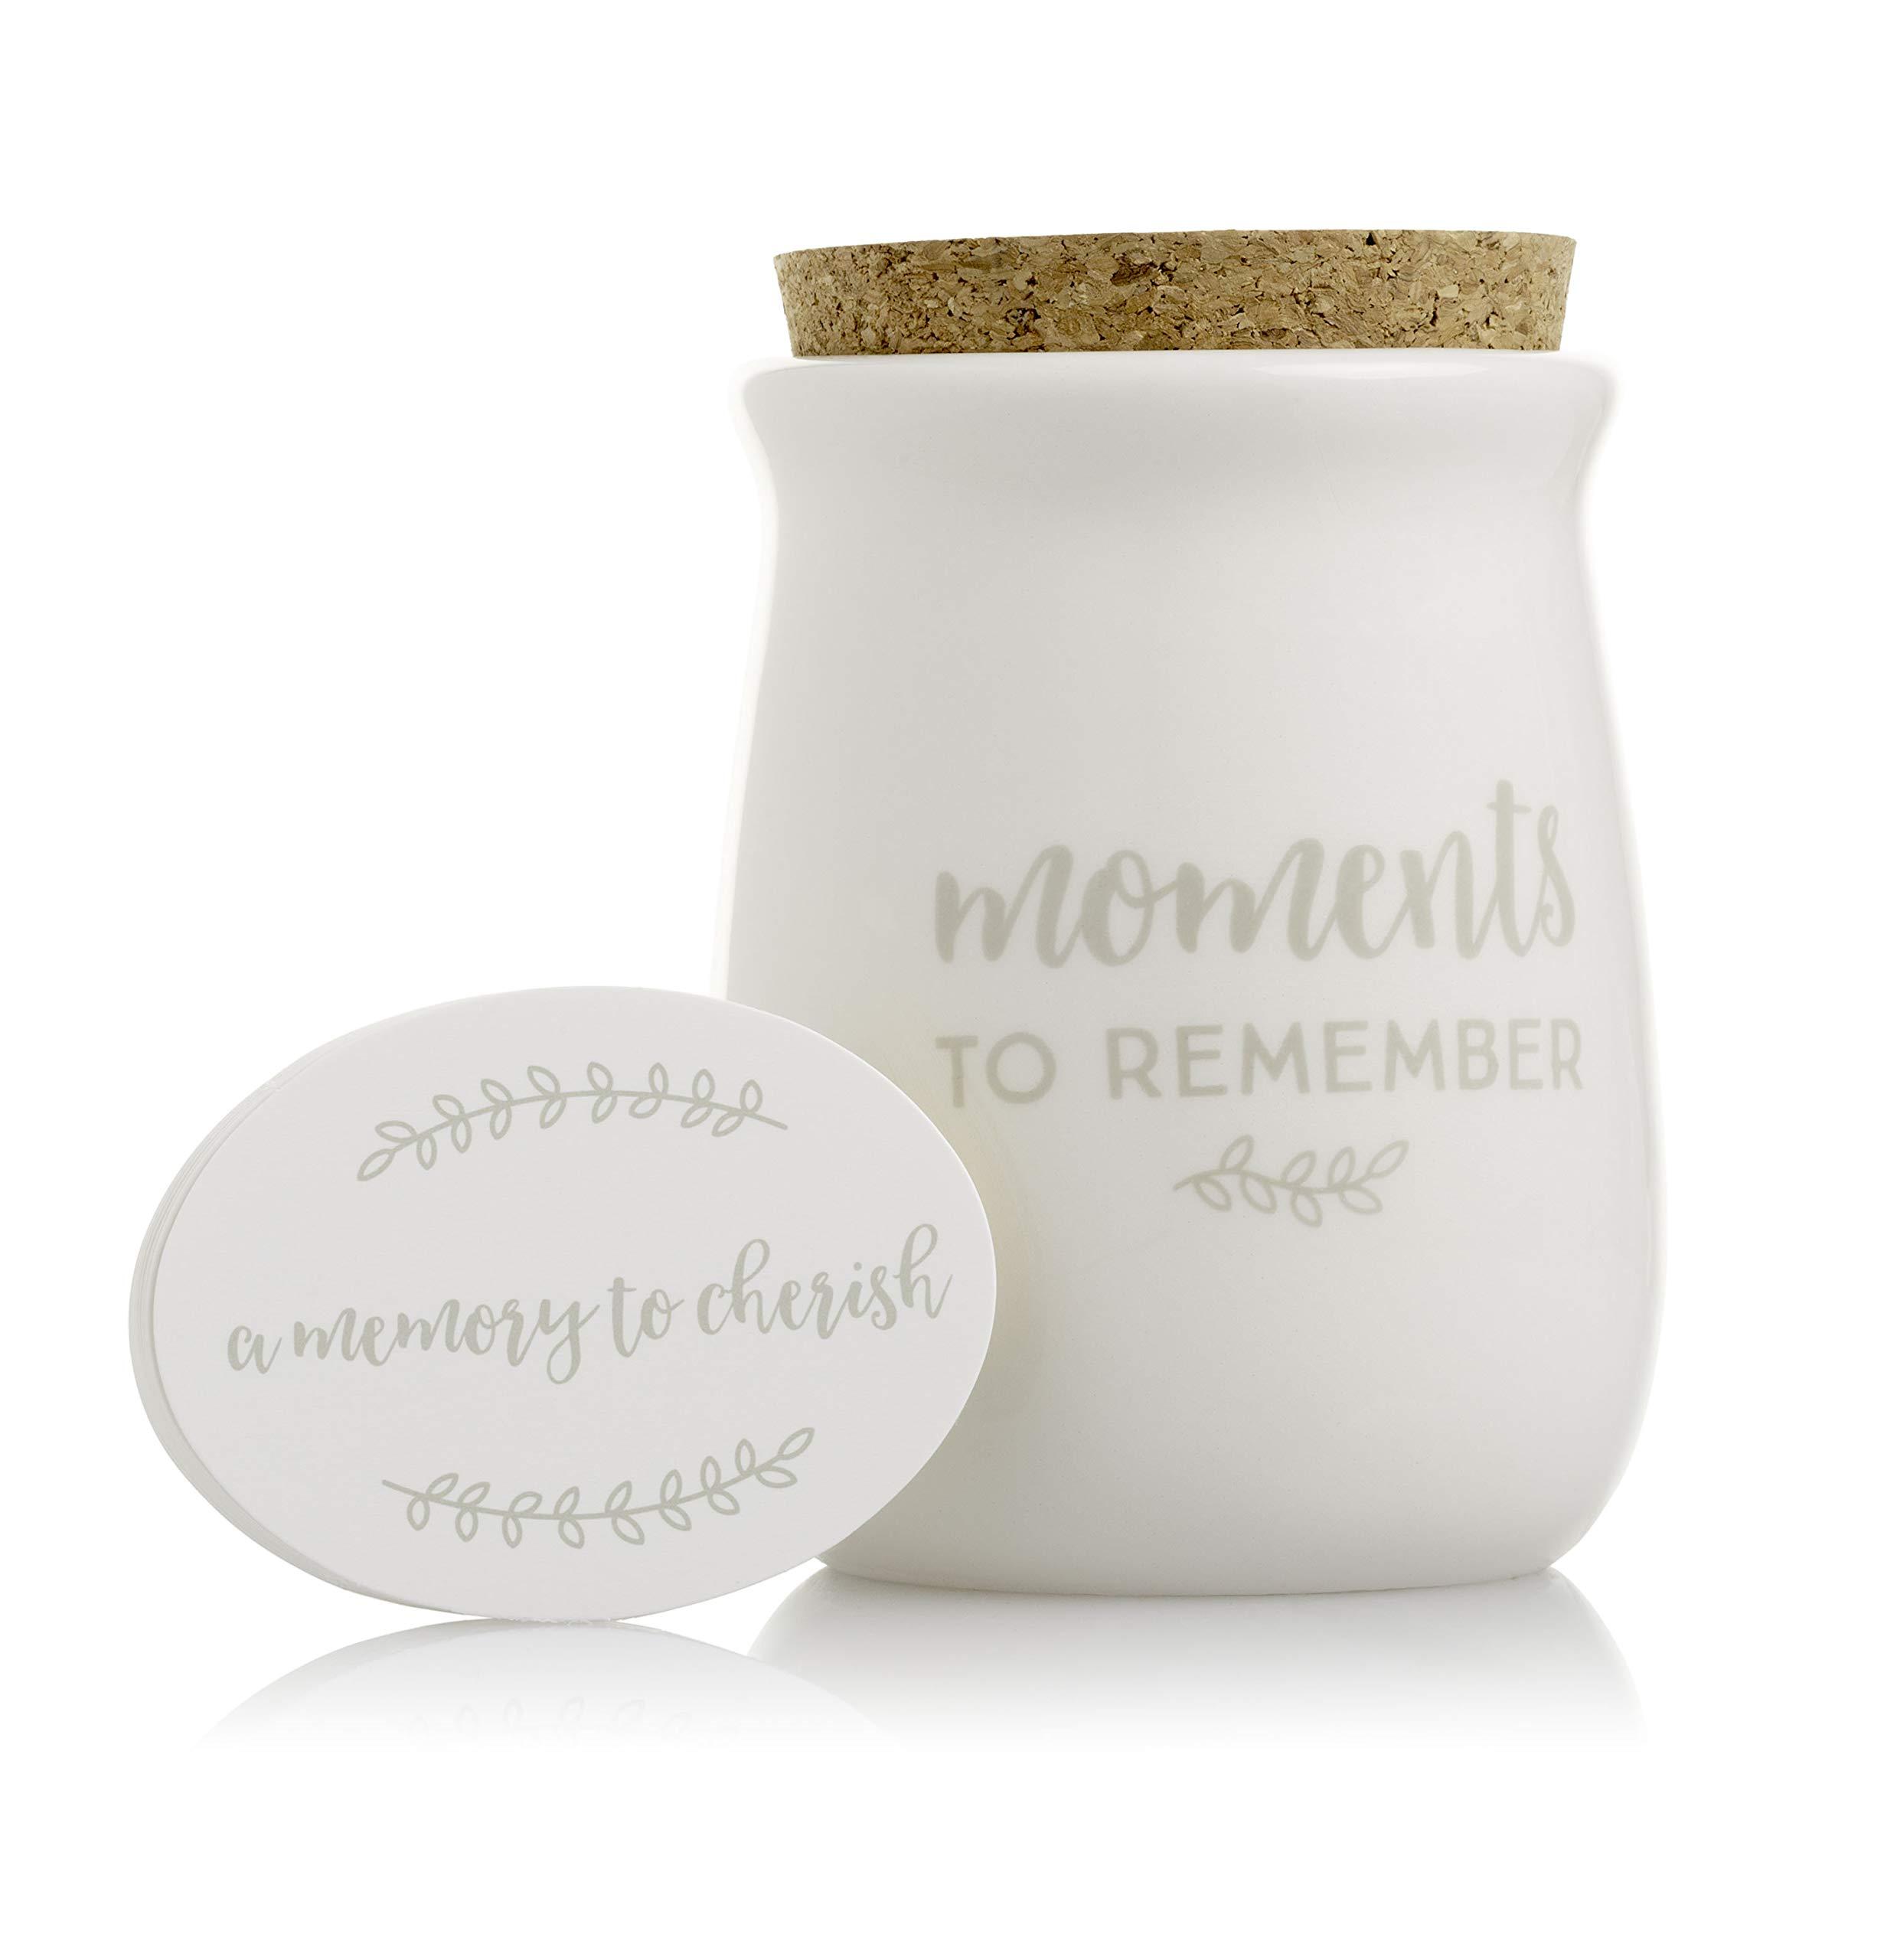 Pearhead Gratitude Jar, Ceramic Blessings Keepsake Jar with Cork Topper & Memories to Cherish Notecards